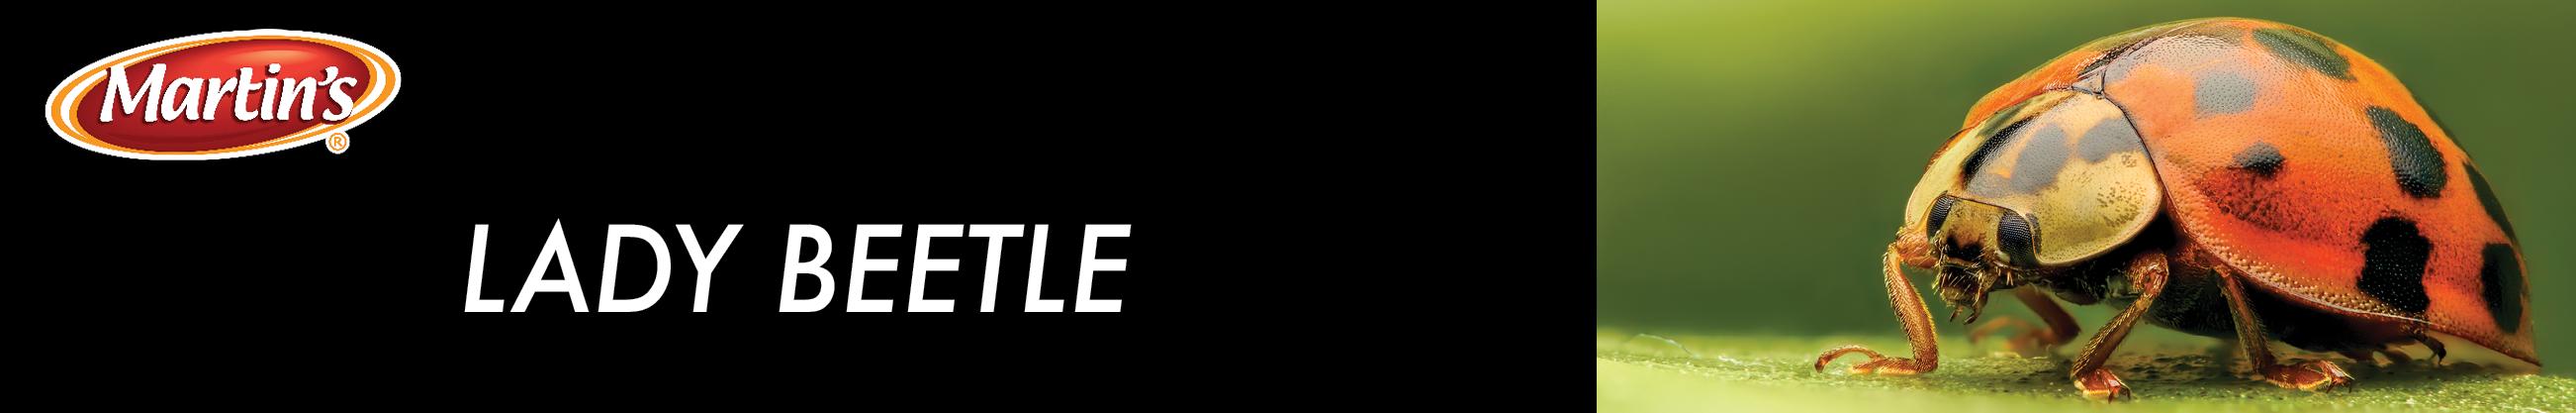 BLOGimage.ladybeetle-1